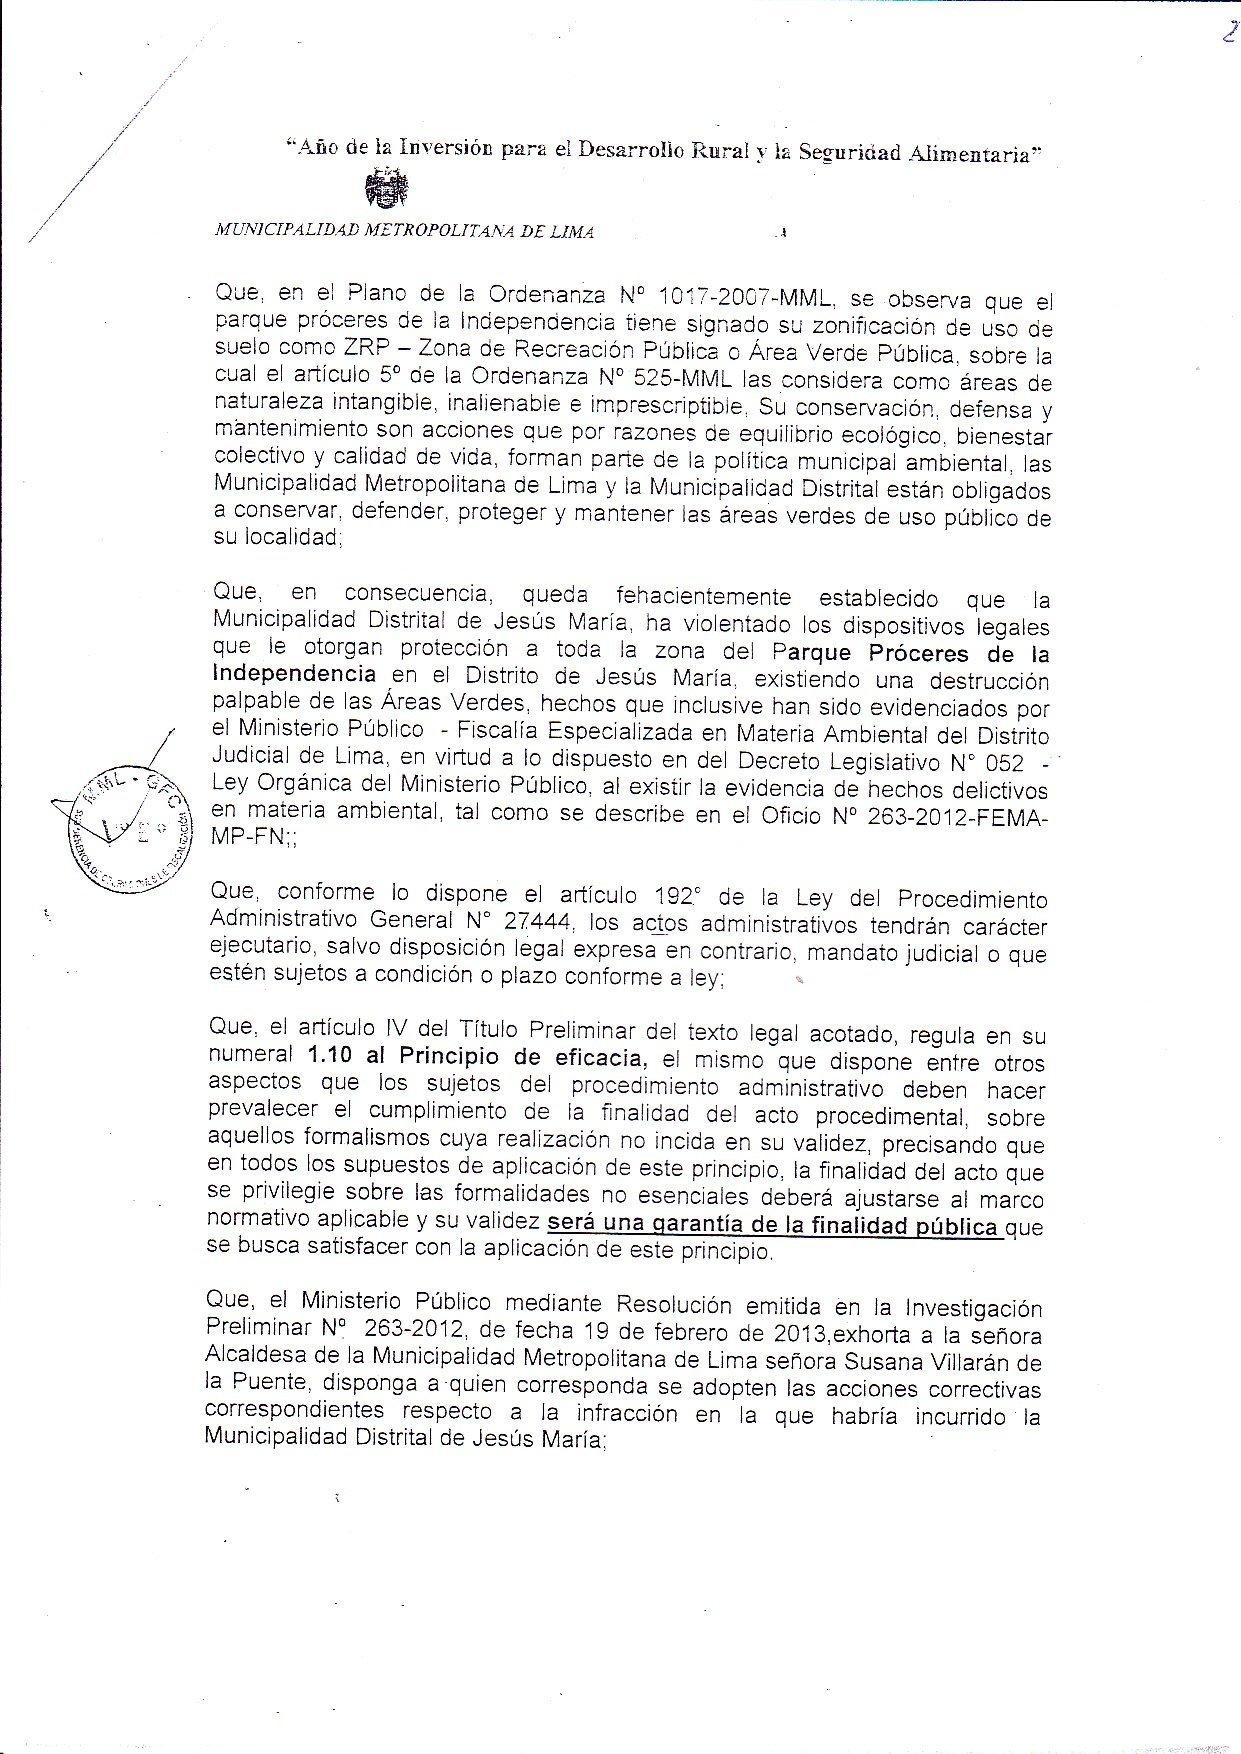 Resolucion Lima 2